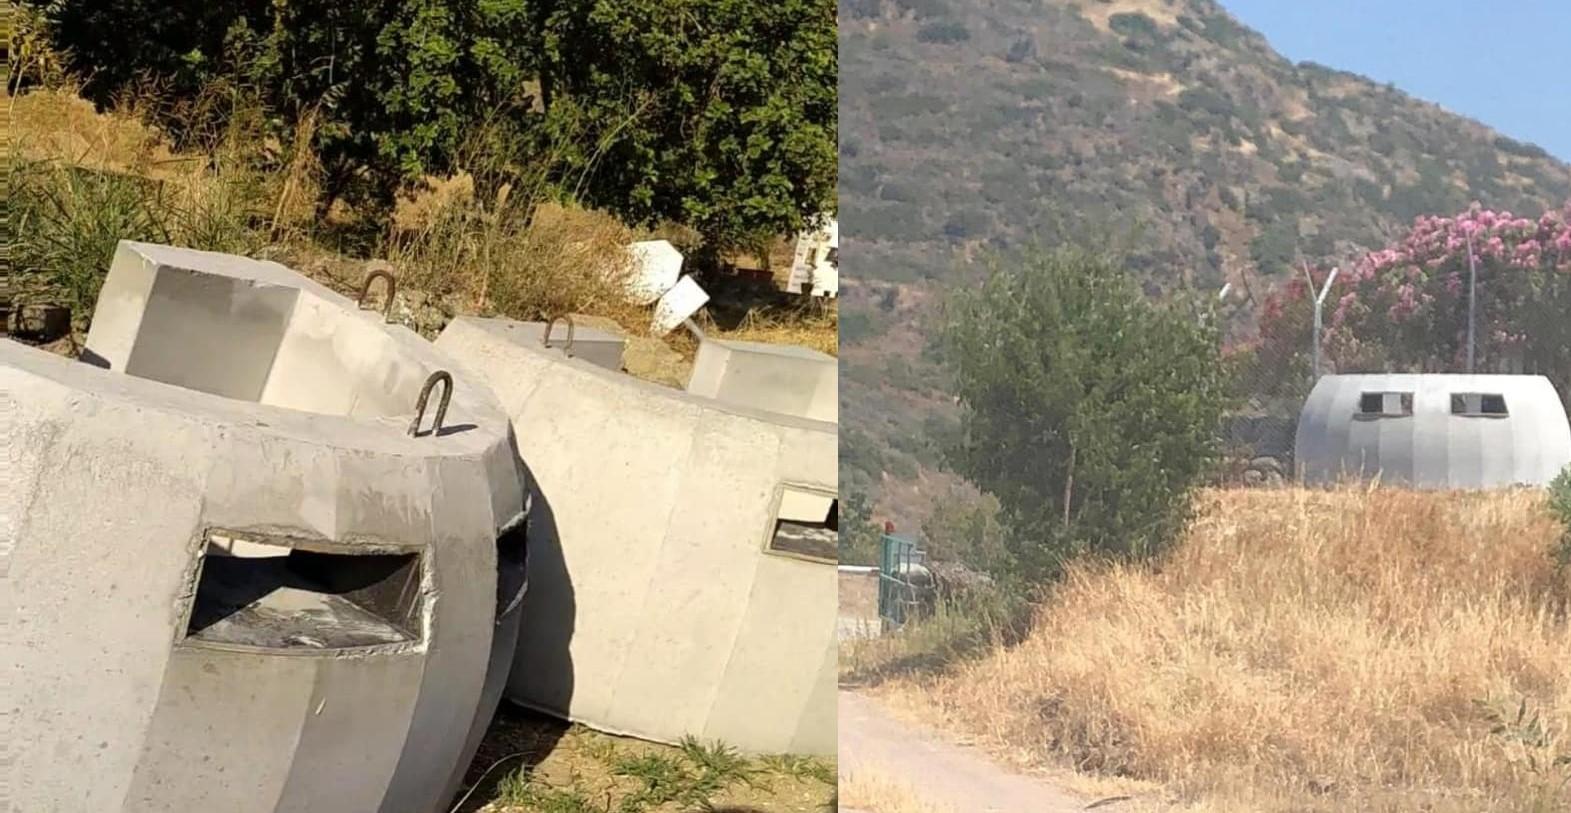 South Placing Portable Concrete Heavy Weapon Shields Near Border Crossings 14